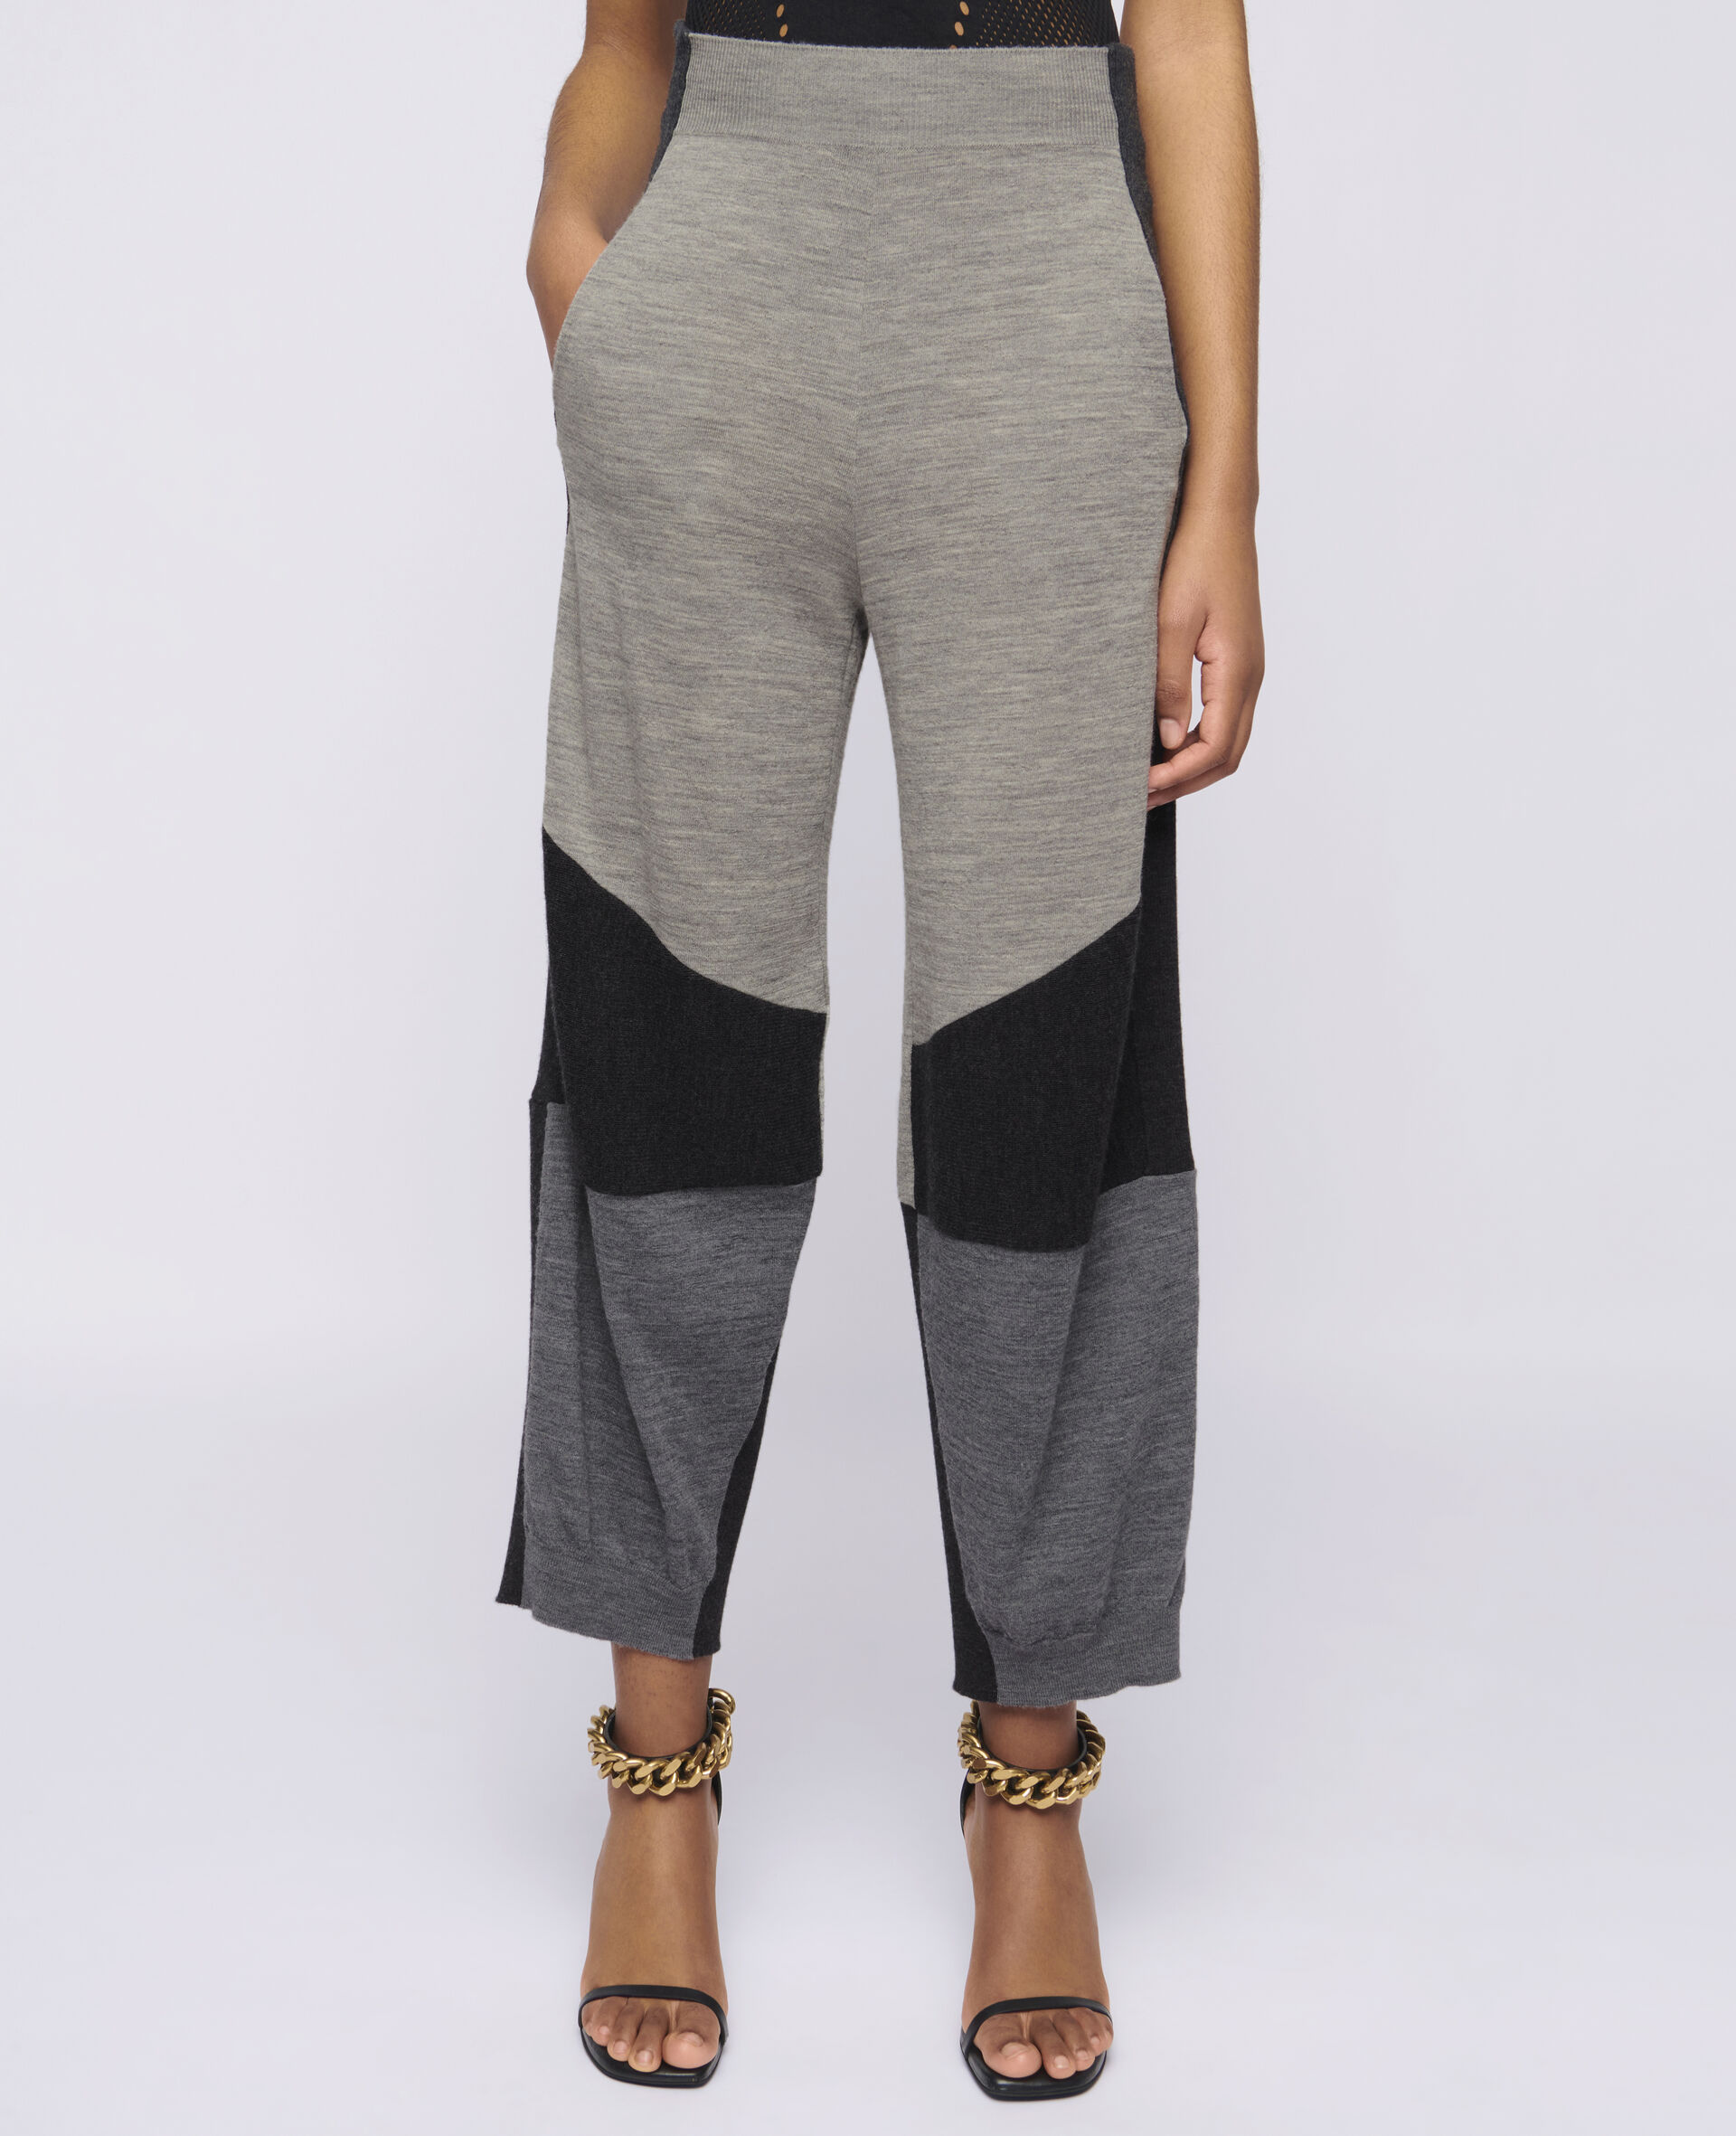 Pantaloni in Maglia-Grigio-large image number 3